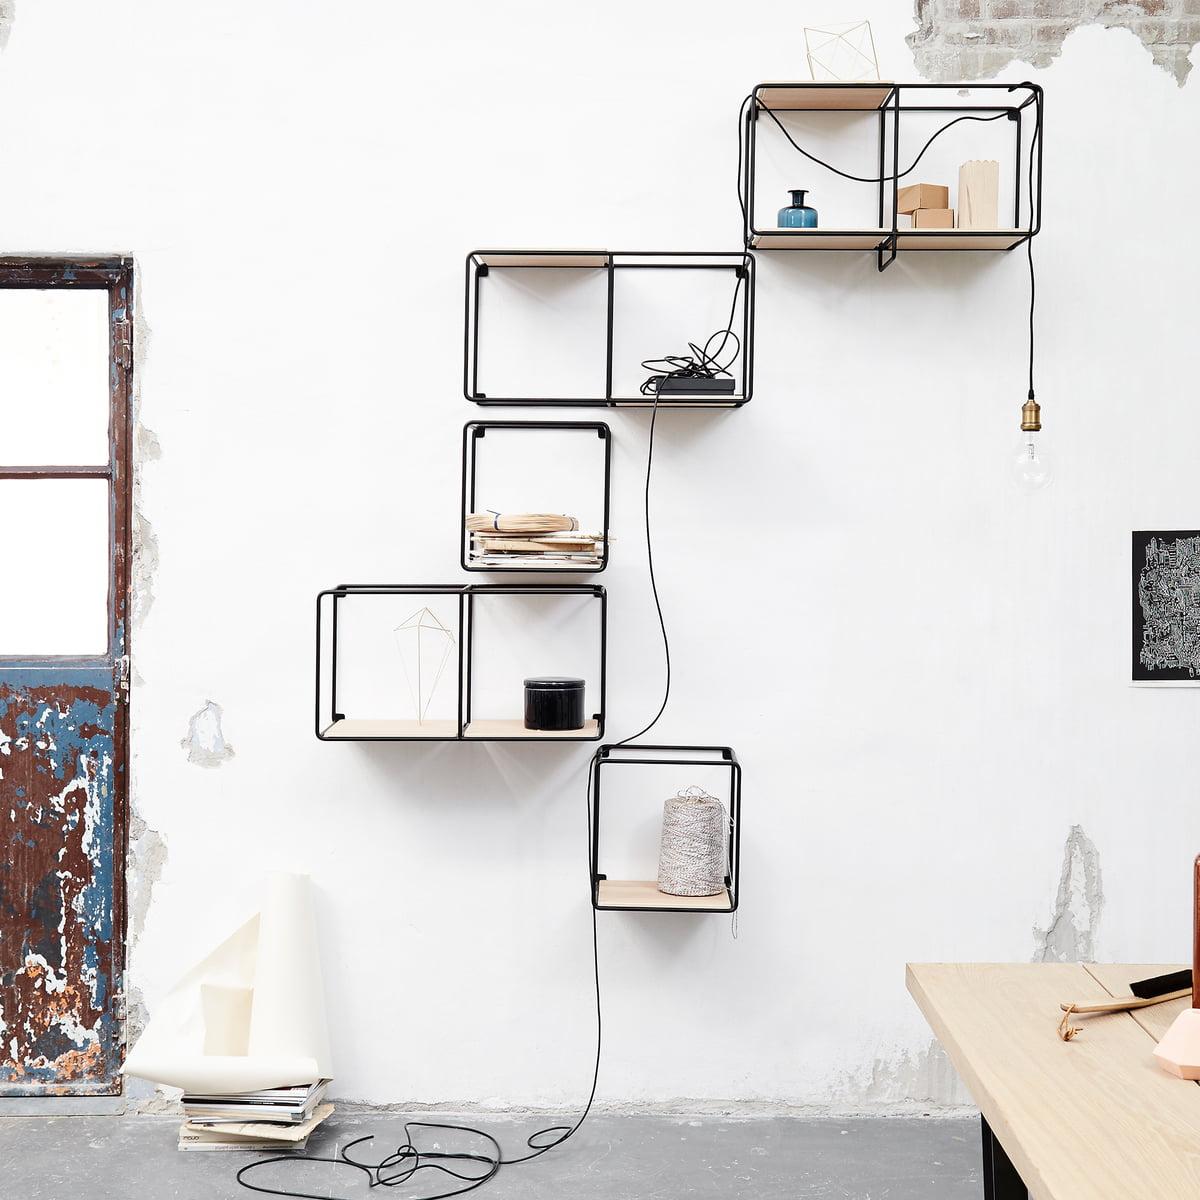 Anywhere 1x1 wall shelf by korridor connox for Garderobe schwarz